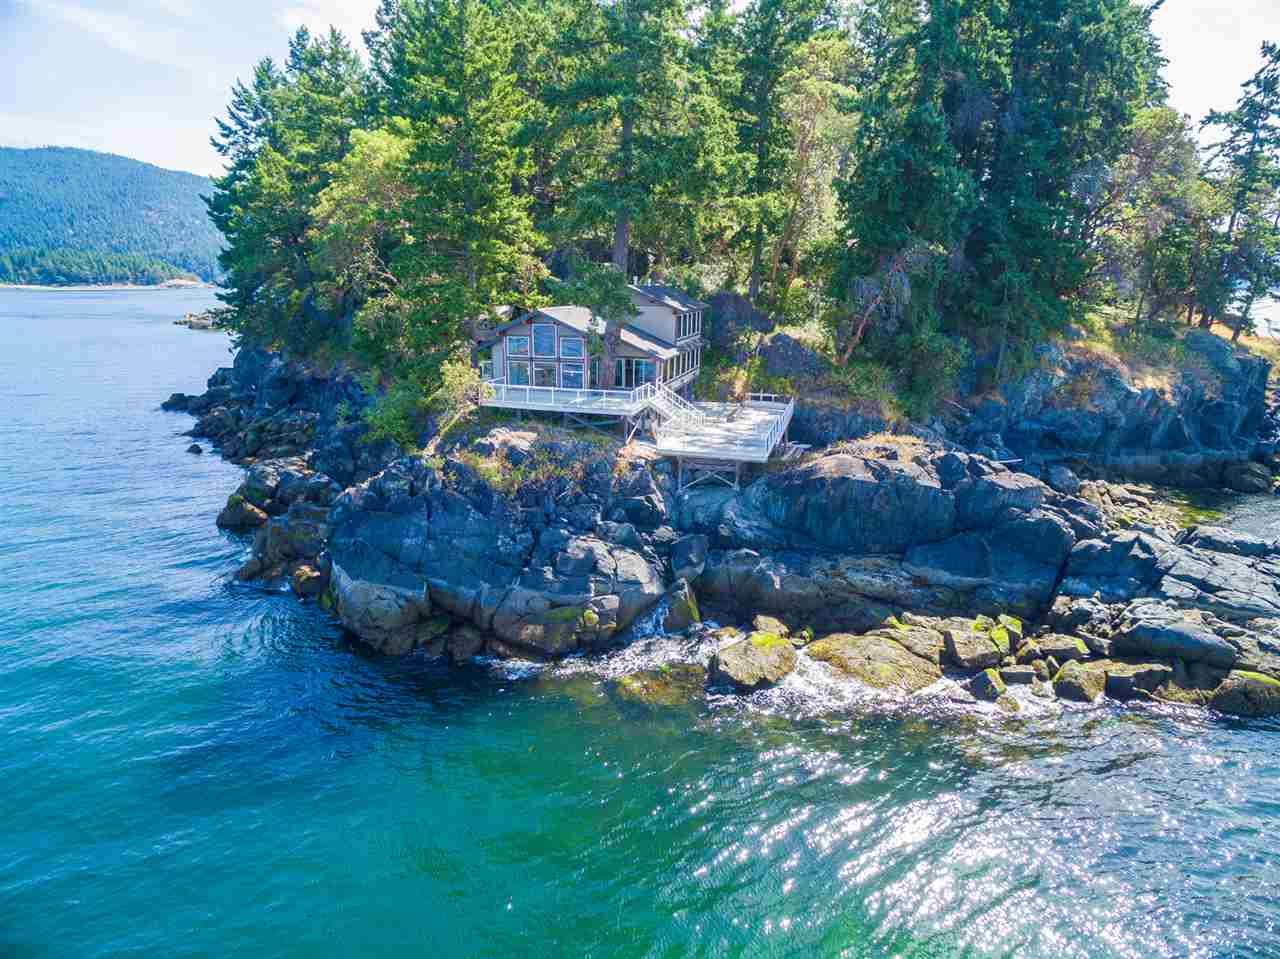 Recreational at 12401 WHITESTONE ROAD, Sunshine Coast, British Columbia. Image 16